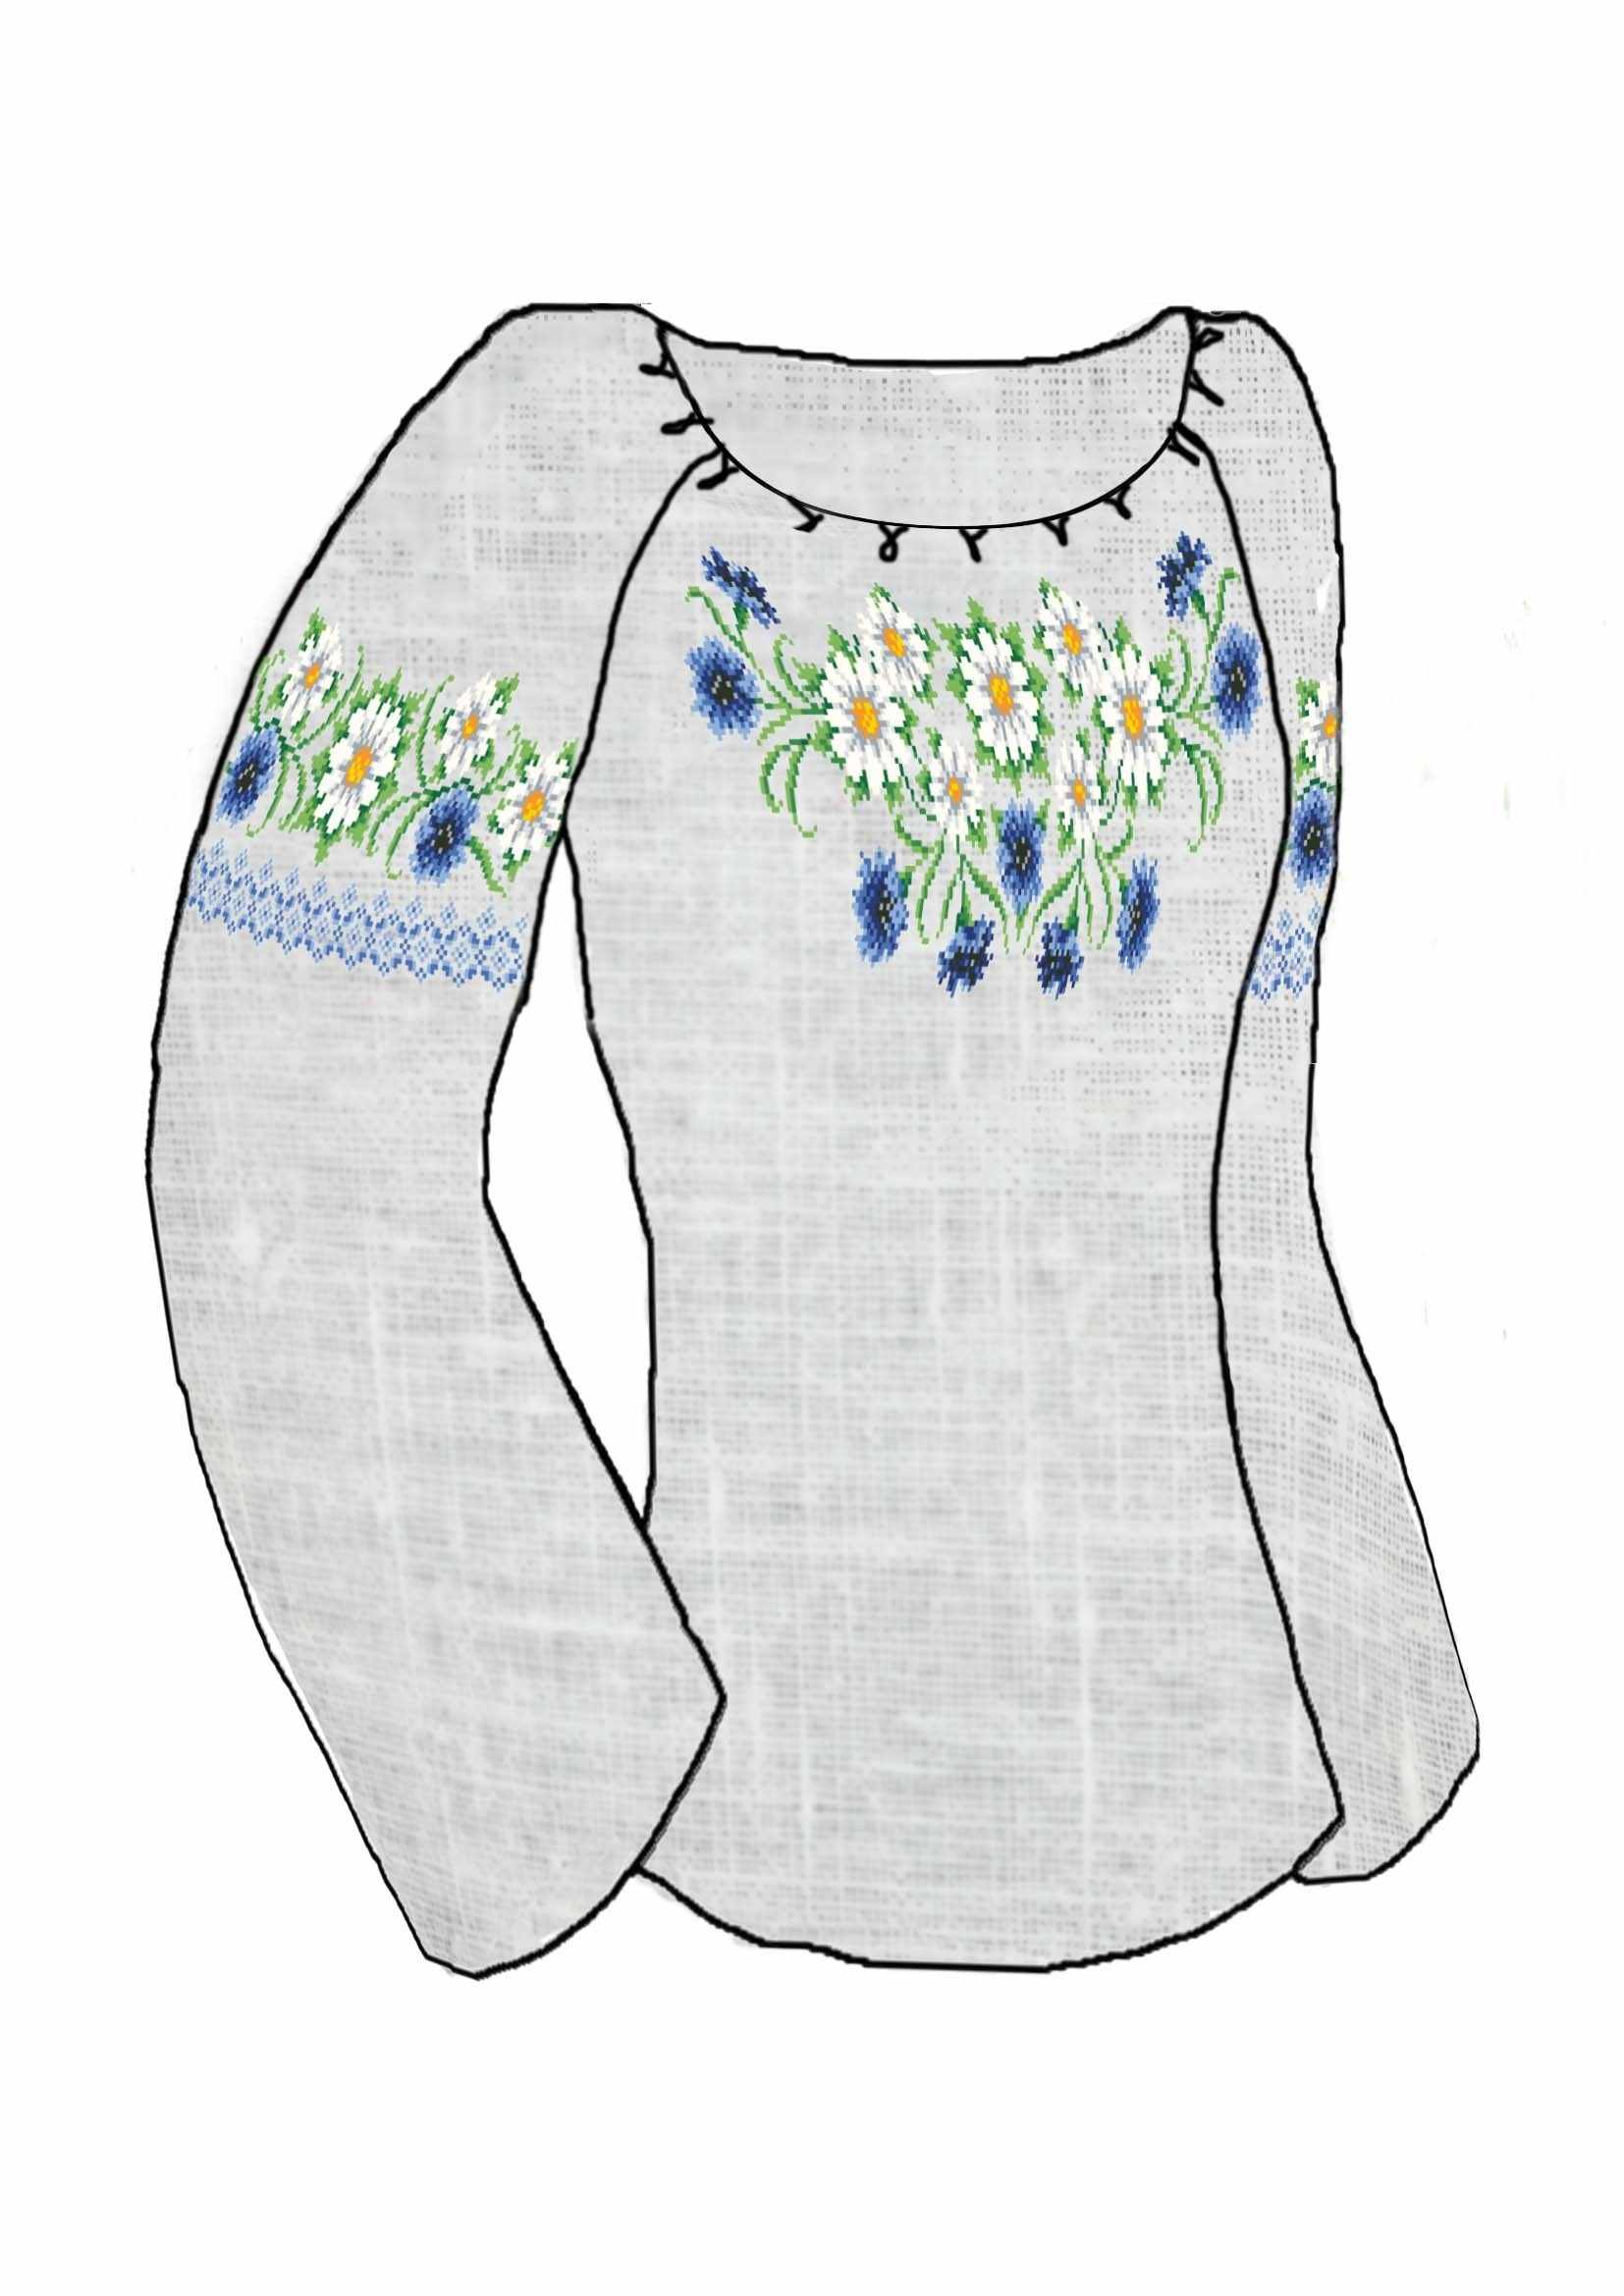 КБСН/лен/-11 Крой 48-54 р Набор для вышивки сорочки (Каролинка)